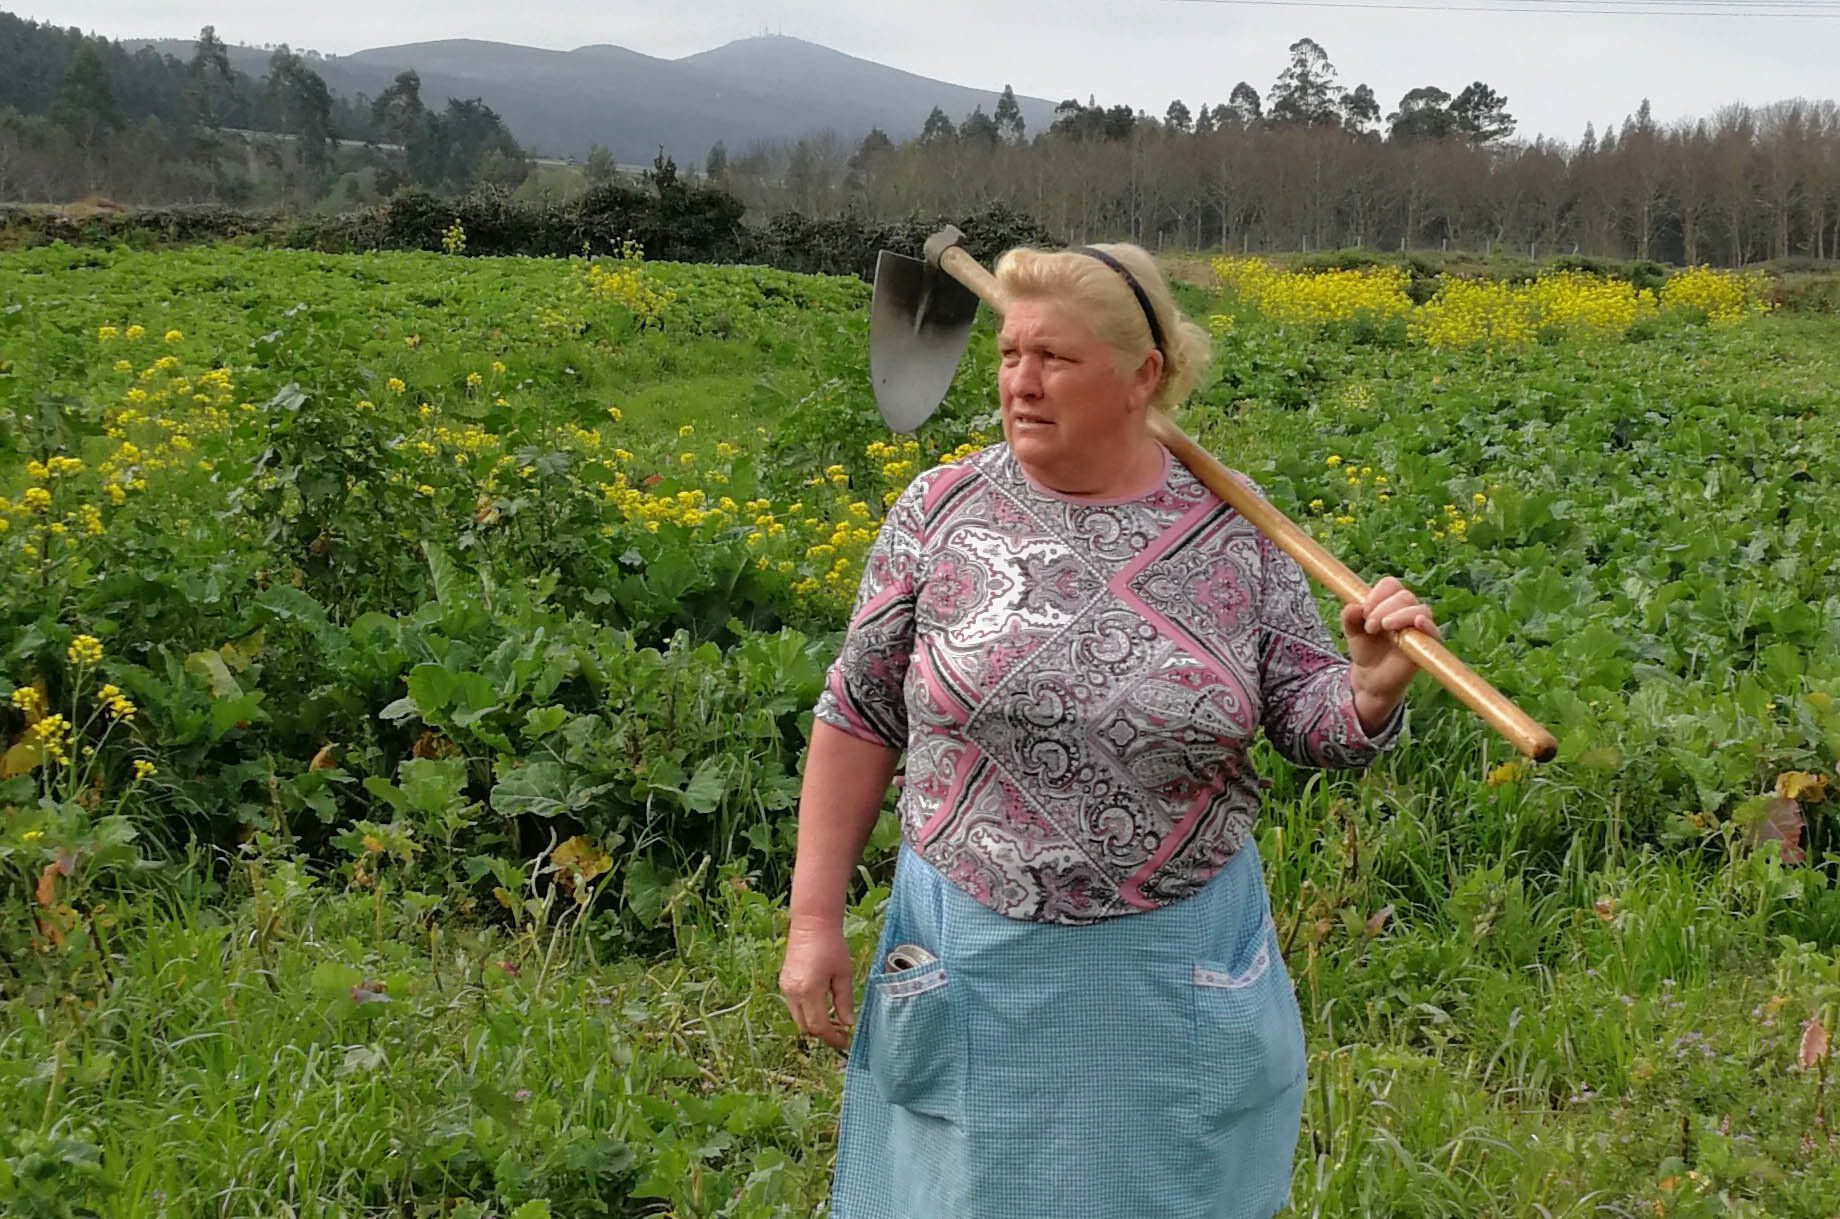 Spanish Woman Looks More Like Trump Than The Donald Himself